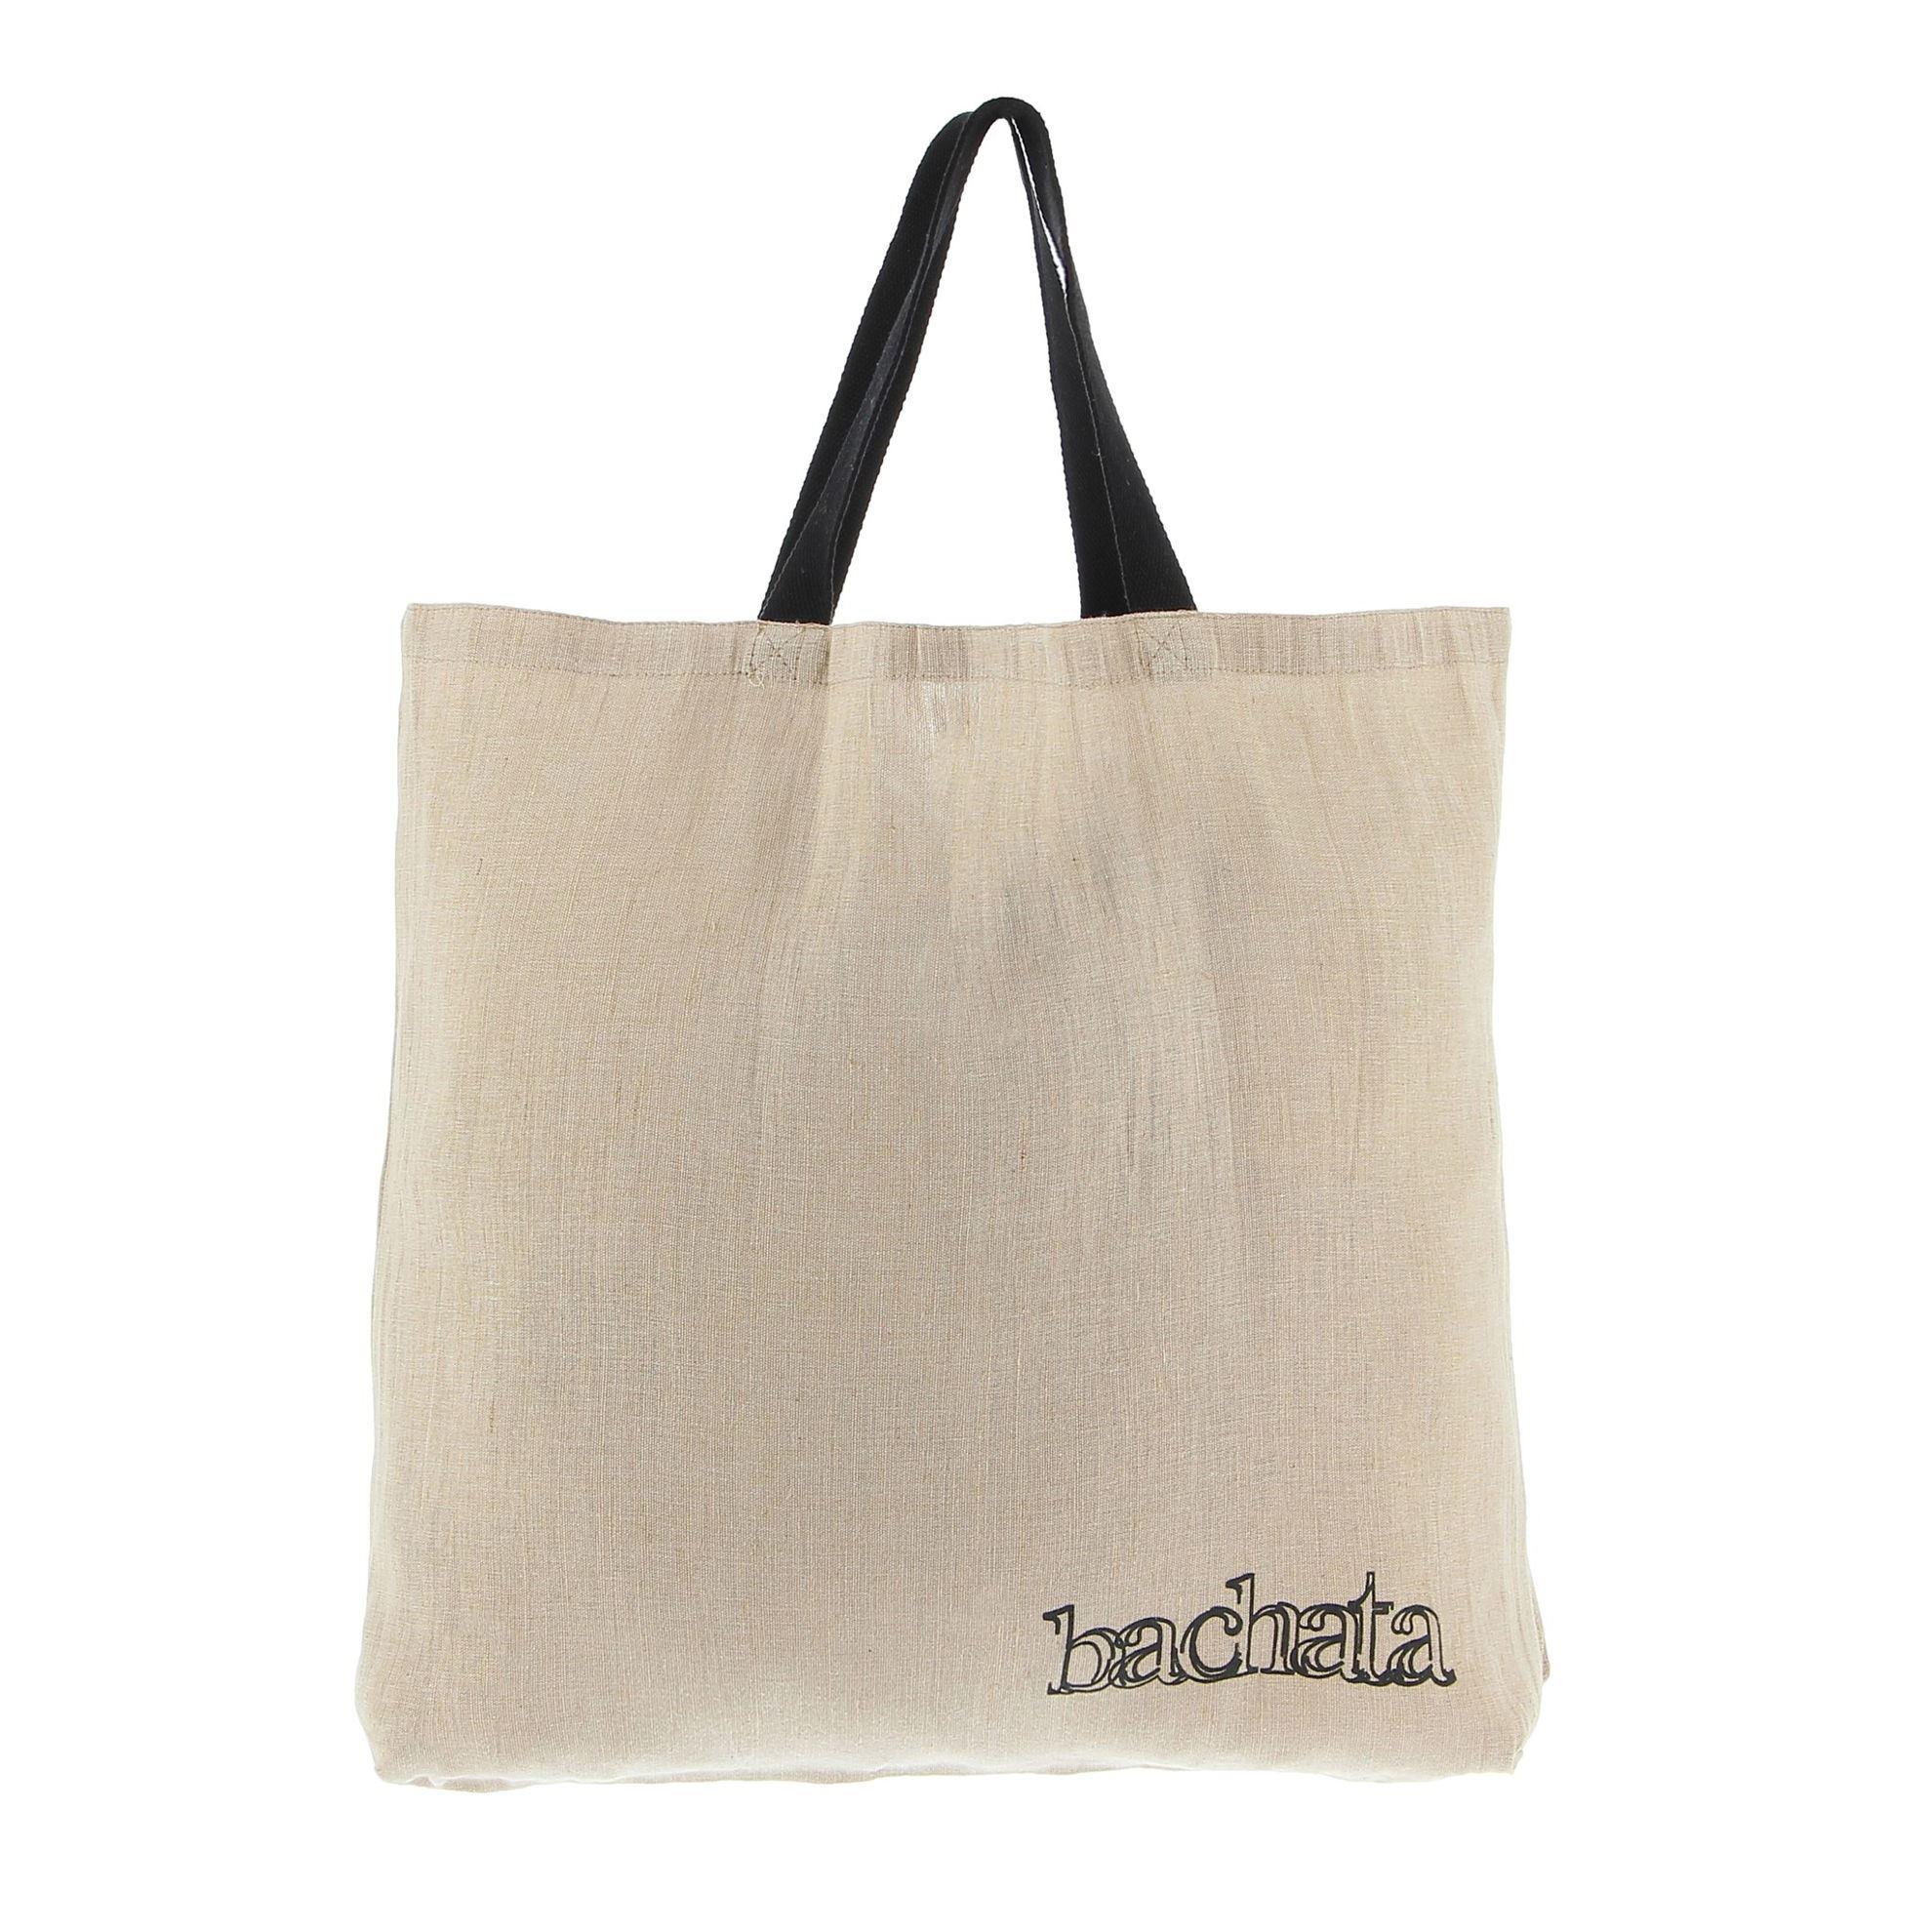 Immagine di BACHATA - SHOPPING BAG